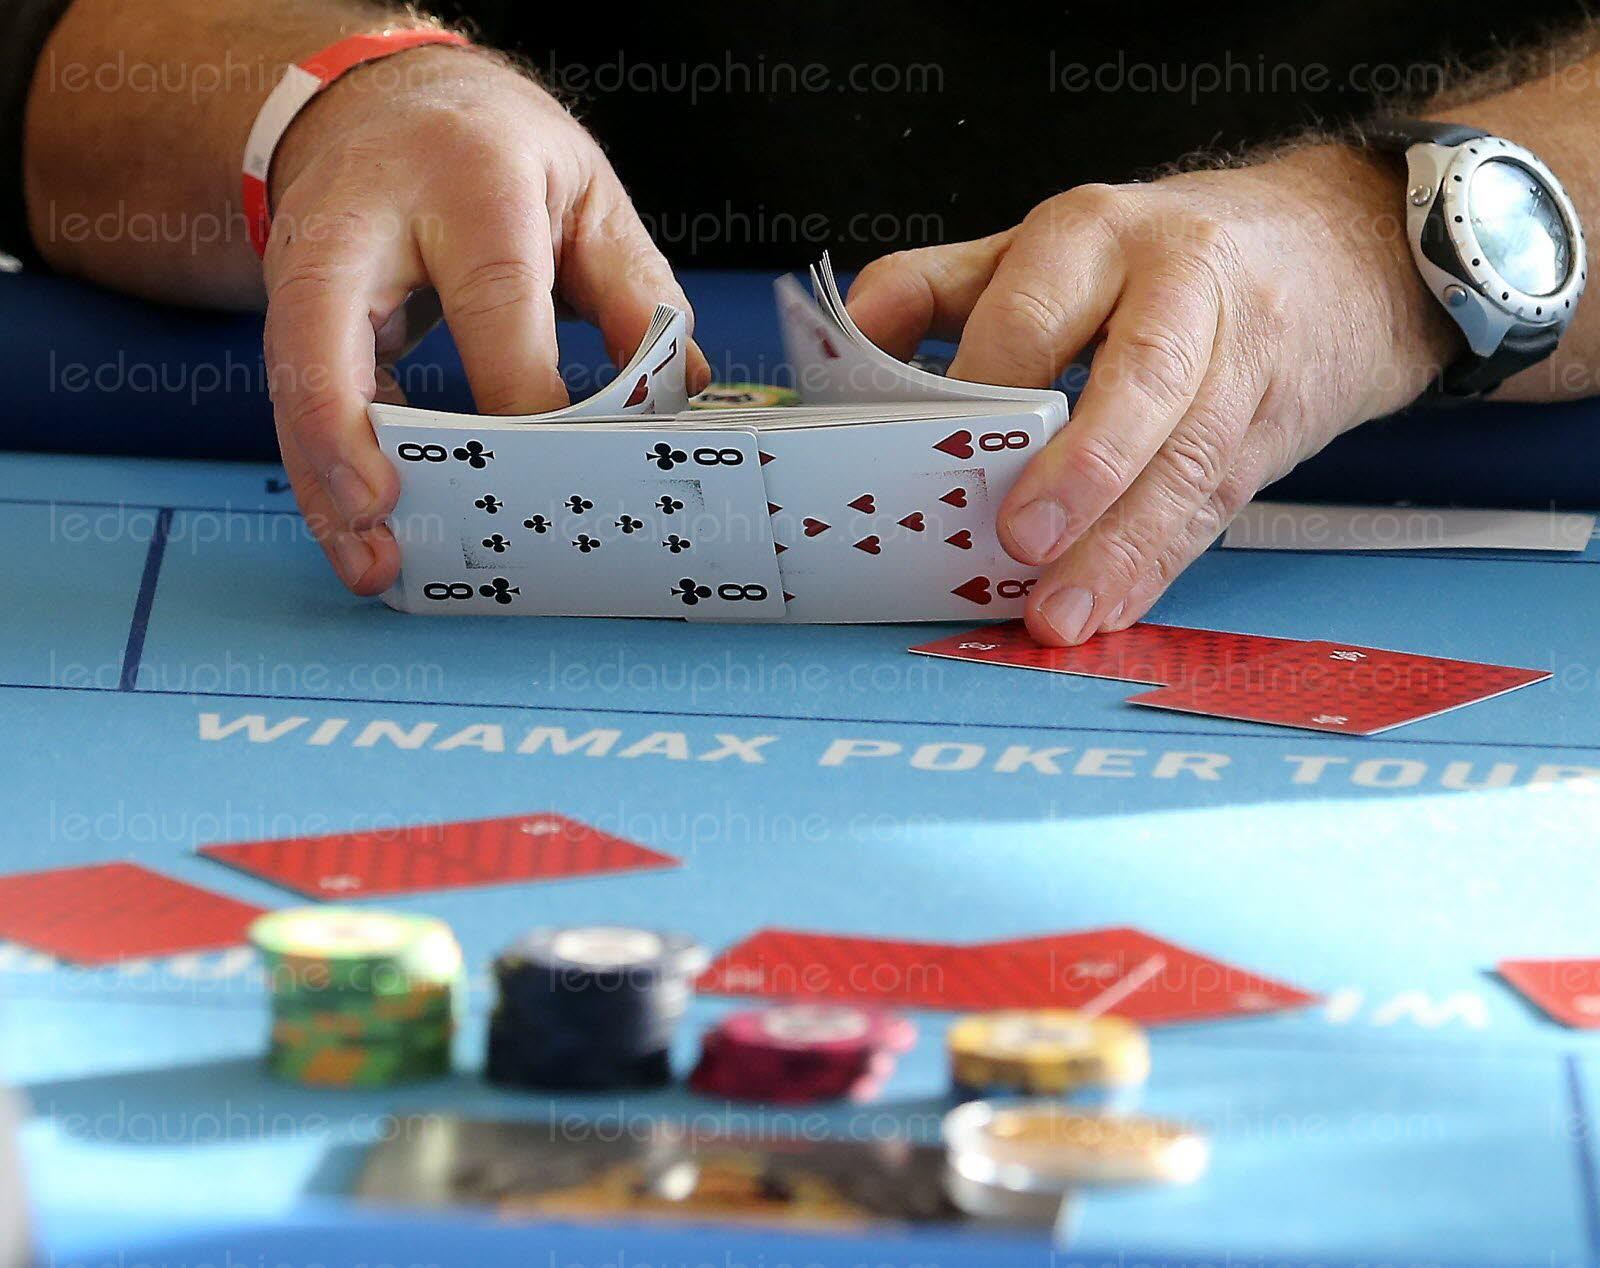 S'enrichir rapidement grâce à casino-tropez-bonus.fr